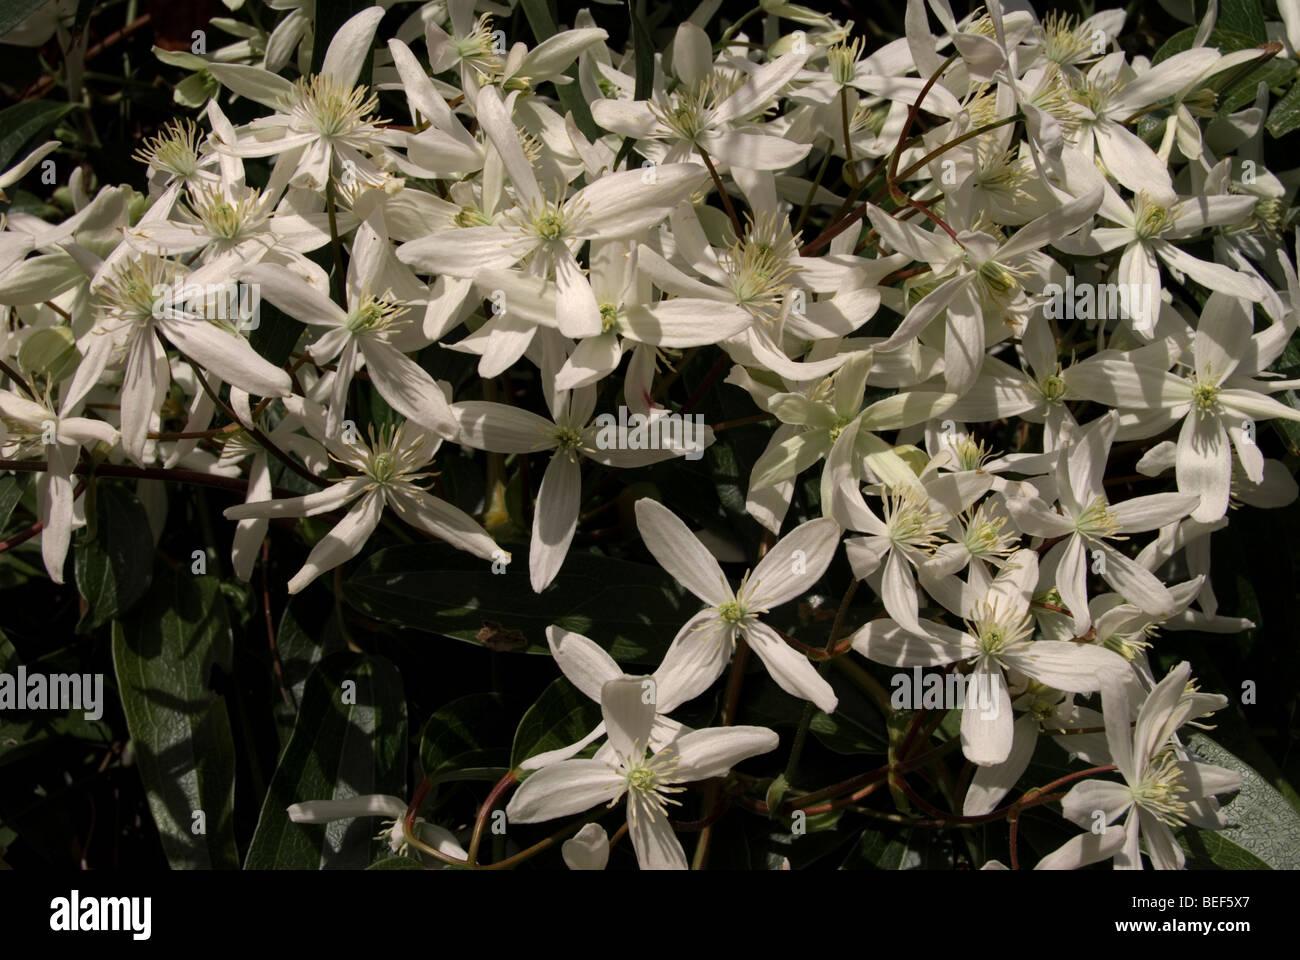 Clemitis armandii 'Snowdrift' - Stock Image